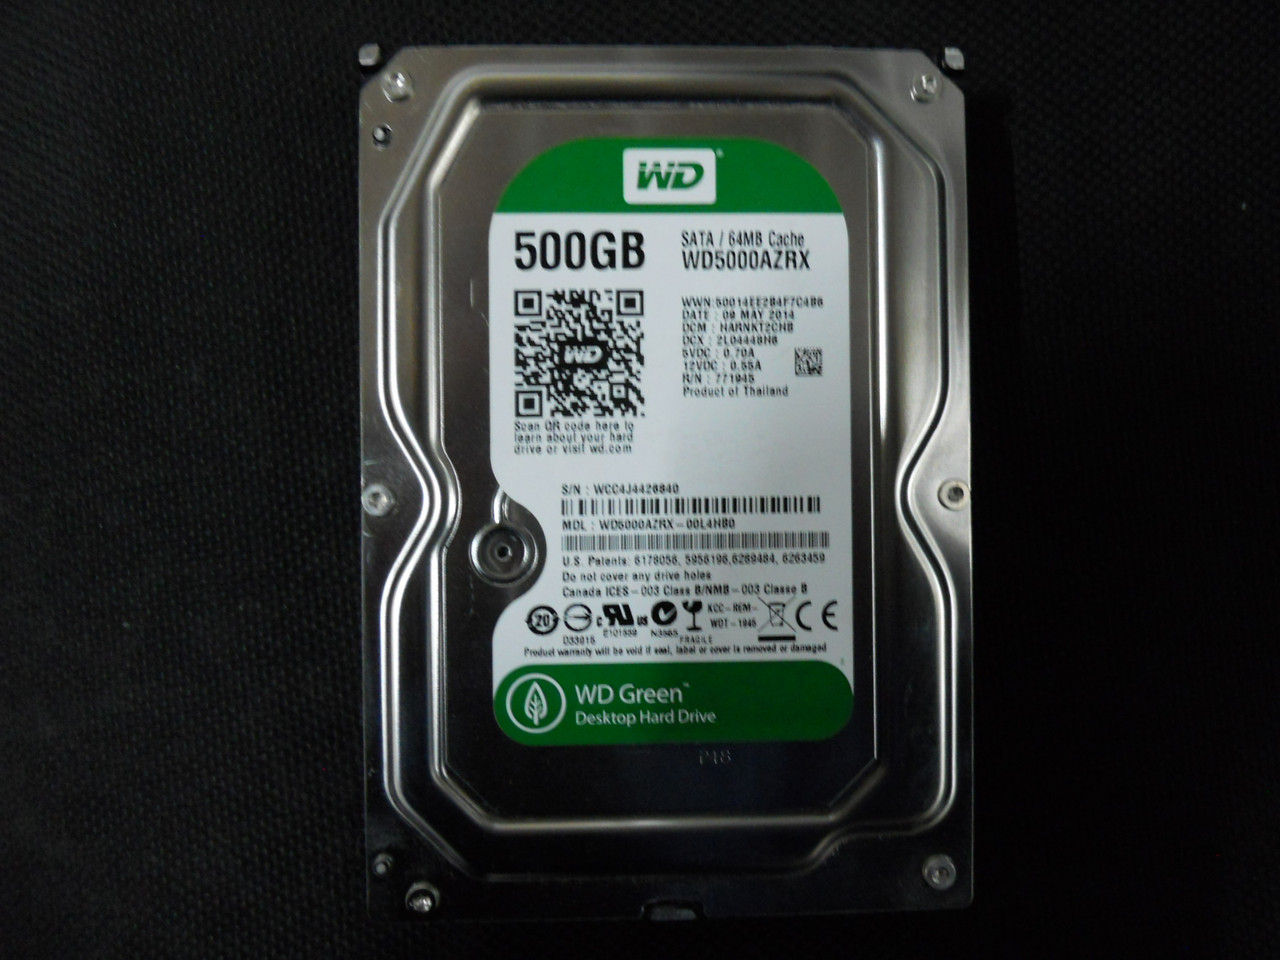 Жесткий диск HDD Western Digital Green 500GB 5400rpm 64МB WD5000AZRX 3.5 SATA III